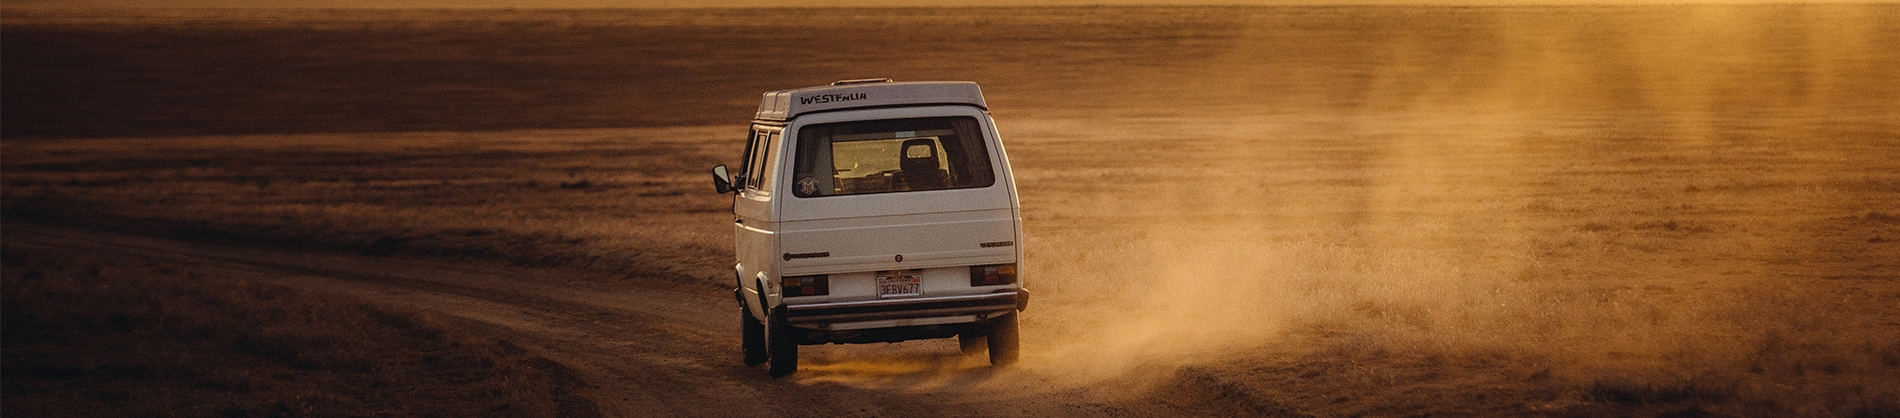 A old van driving through the desert